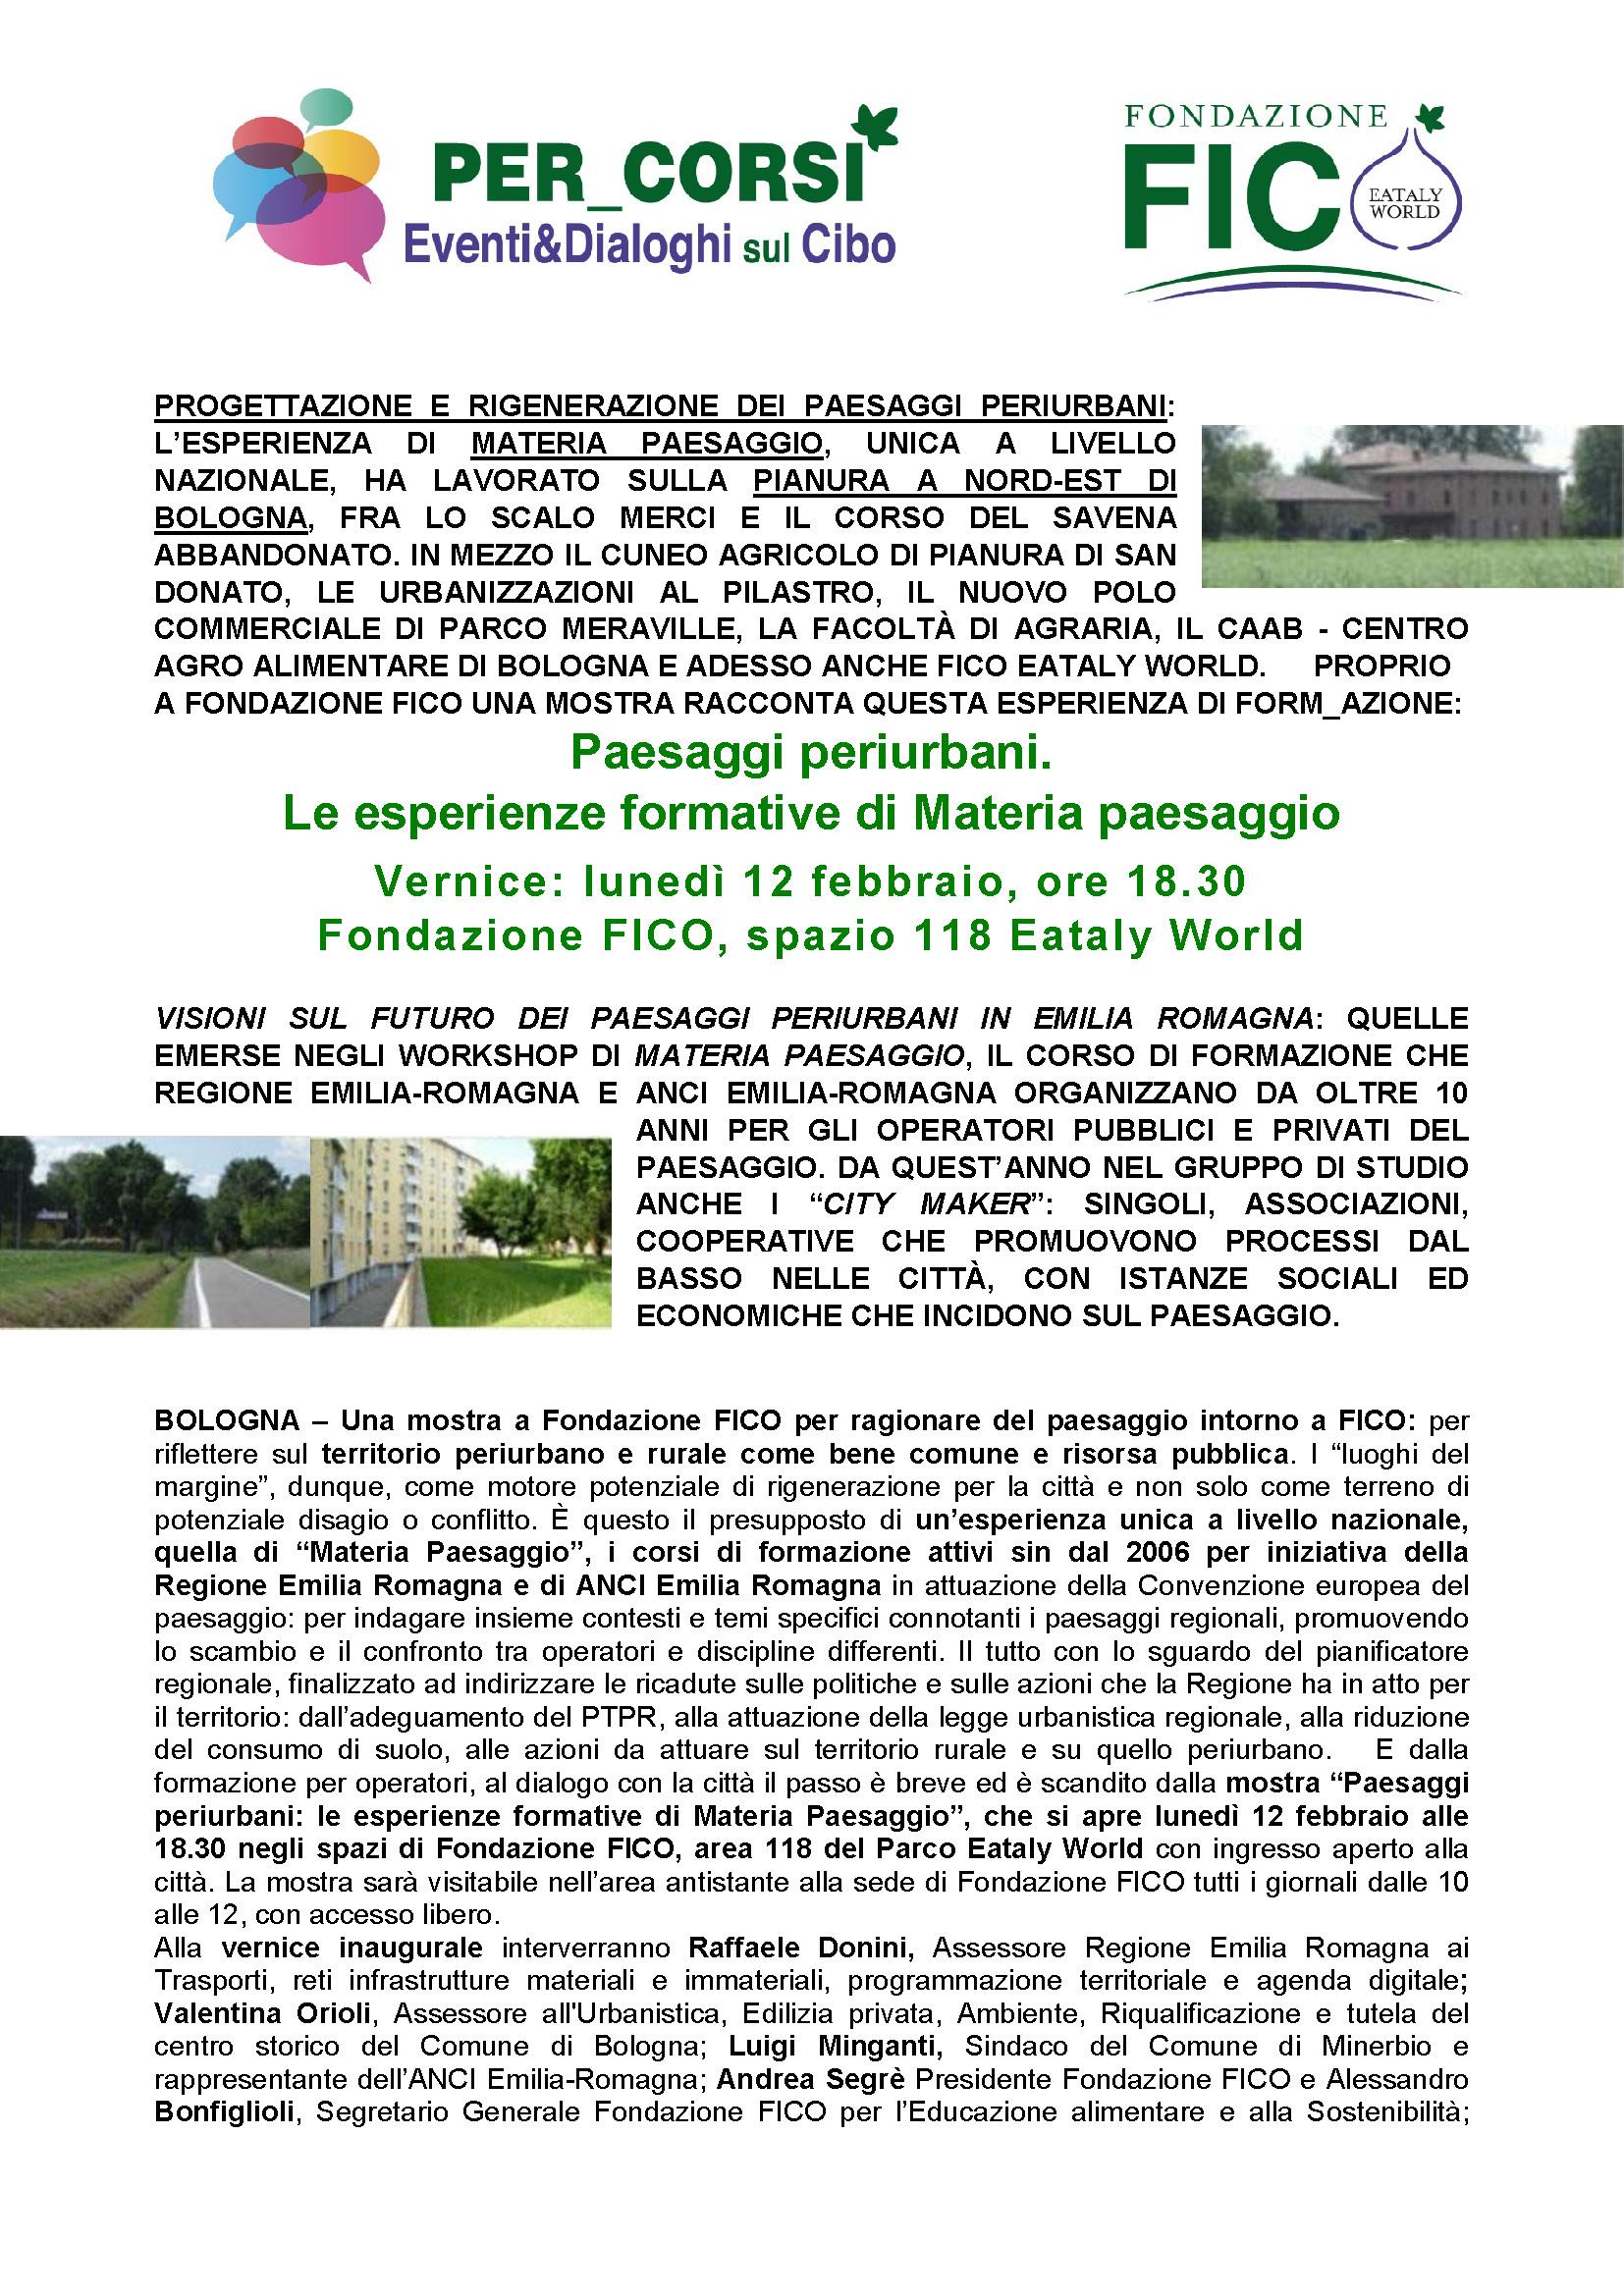 CS-0020-Paesaggii-Periurbani-12-02-18_Pagina_1